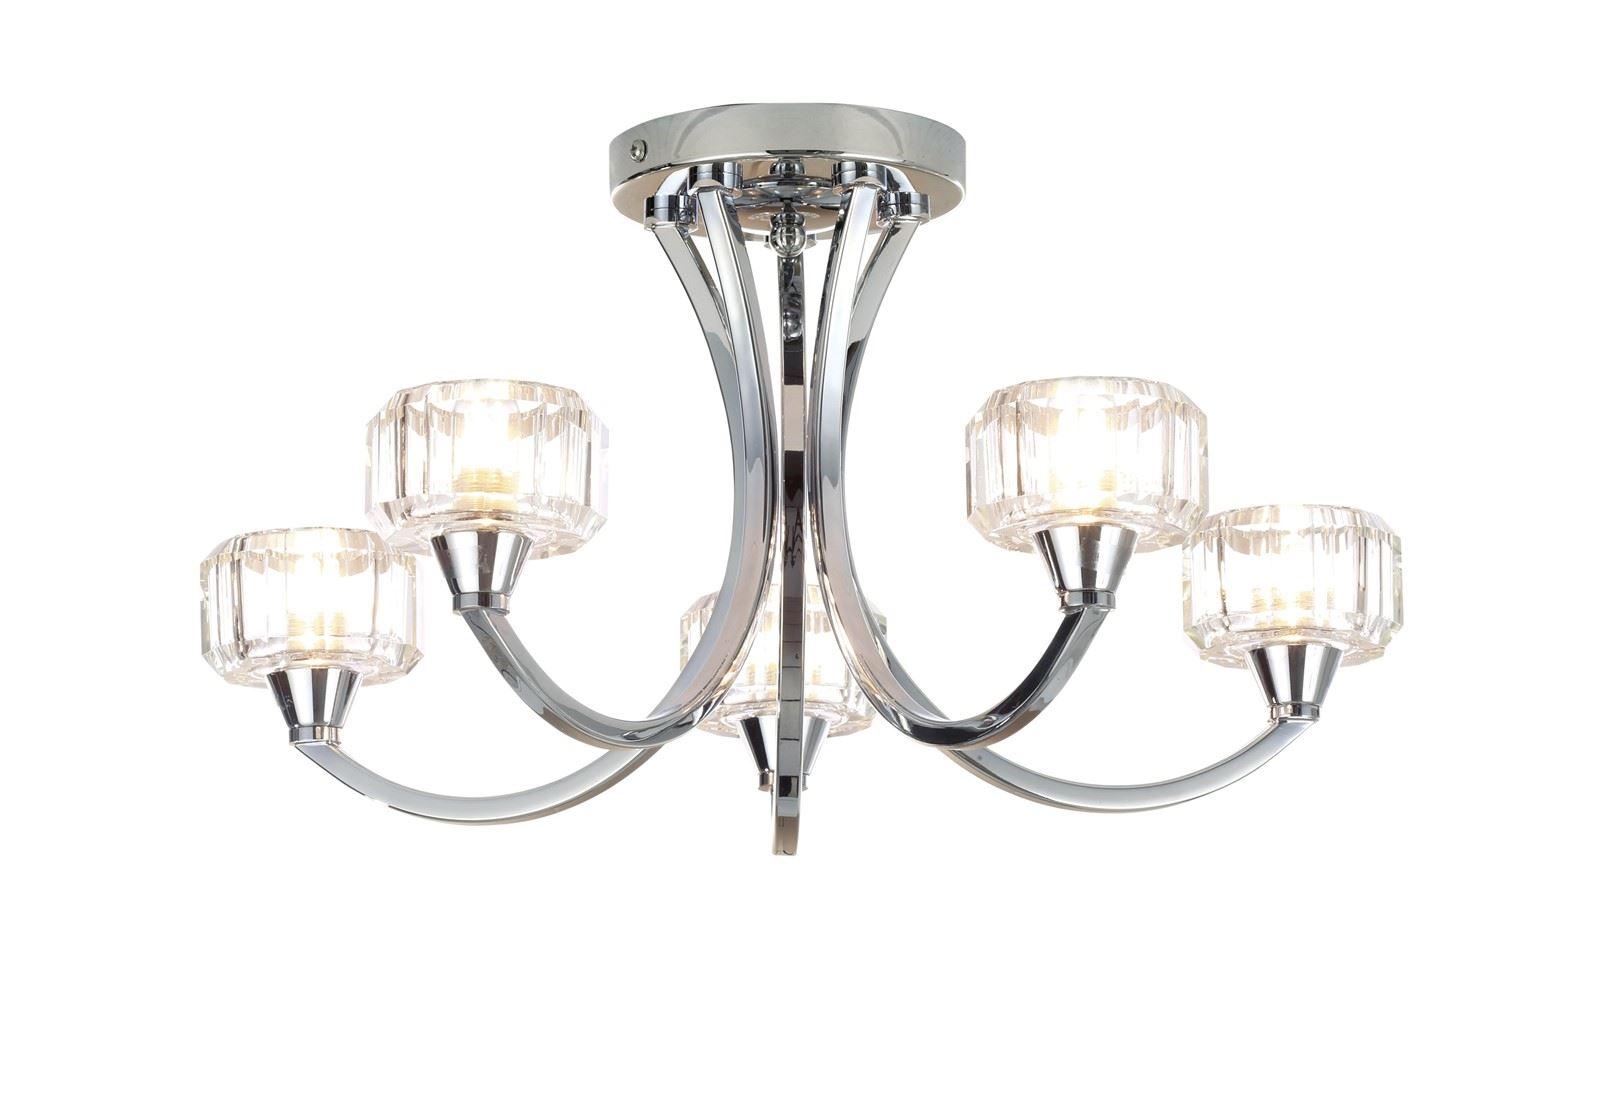 Octans 5 Light Ceiling Fitting